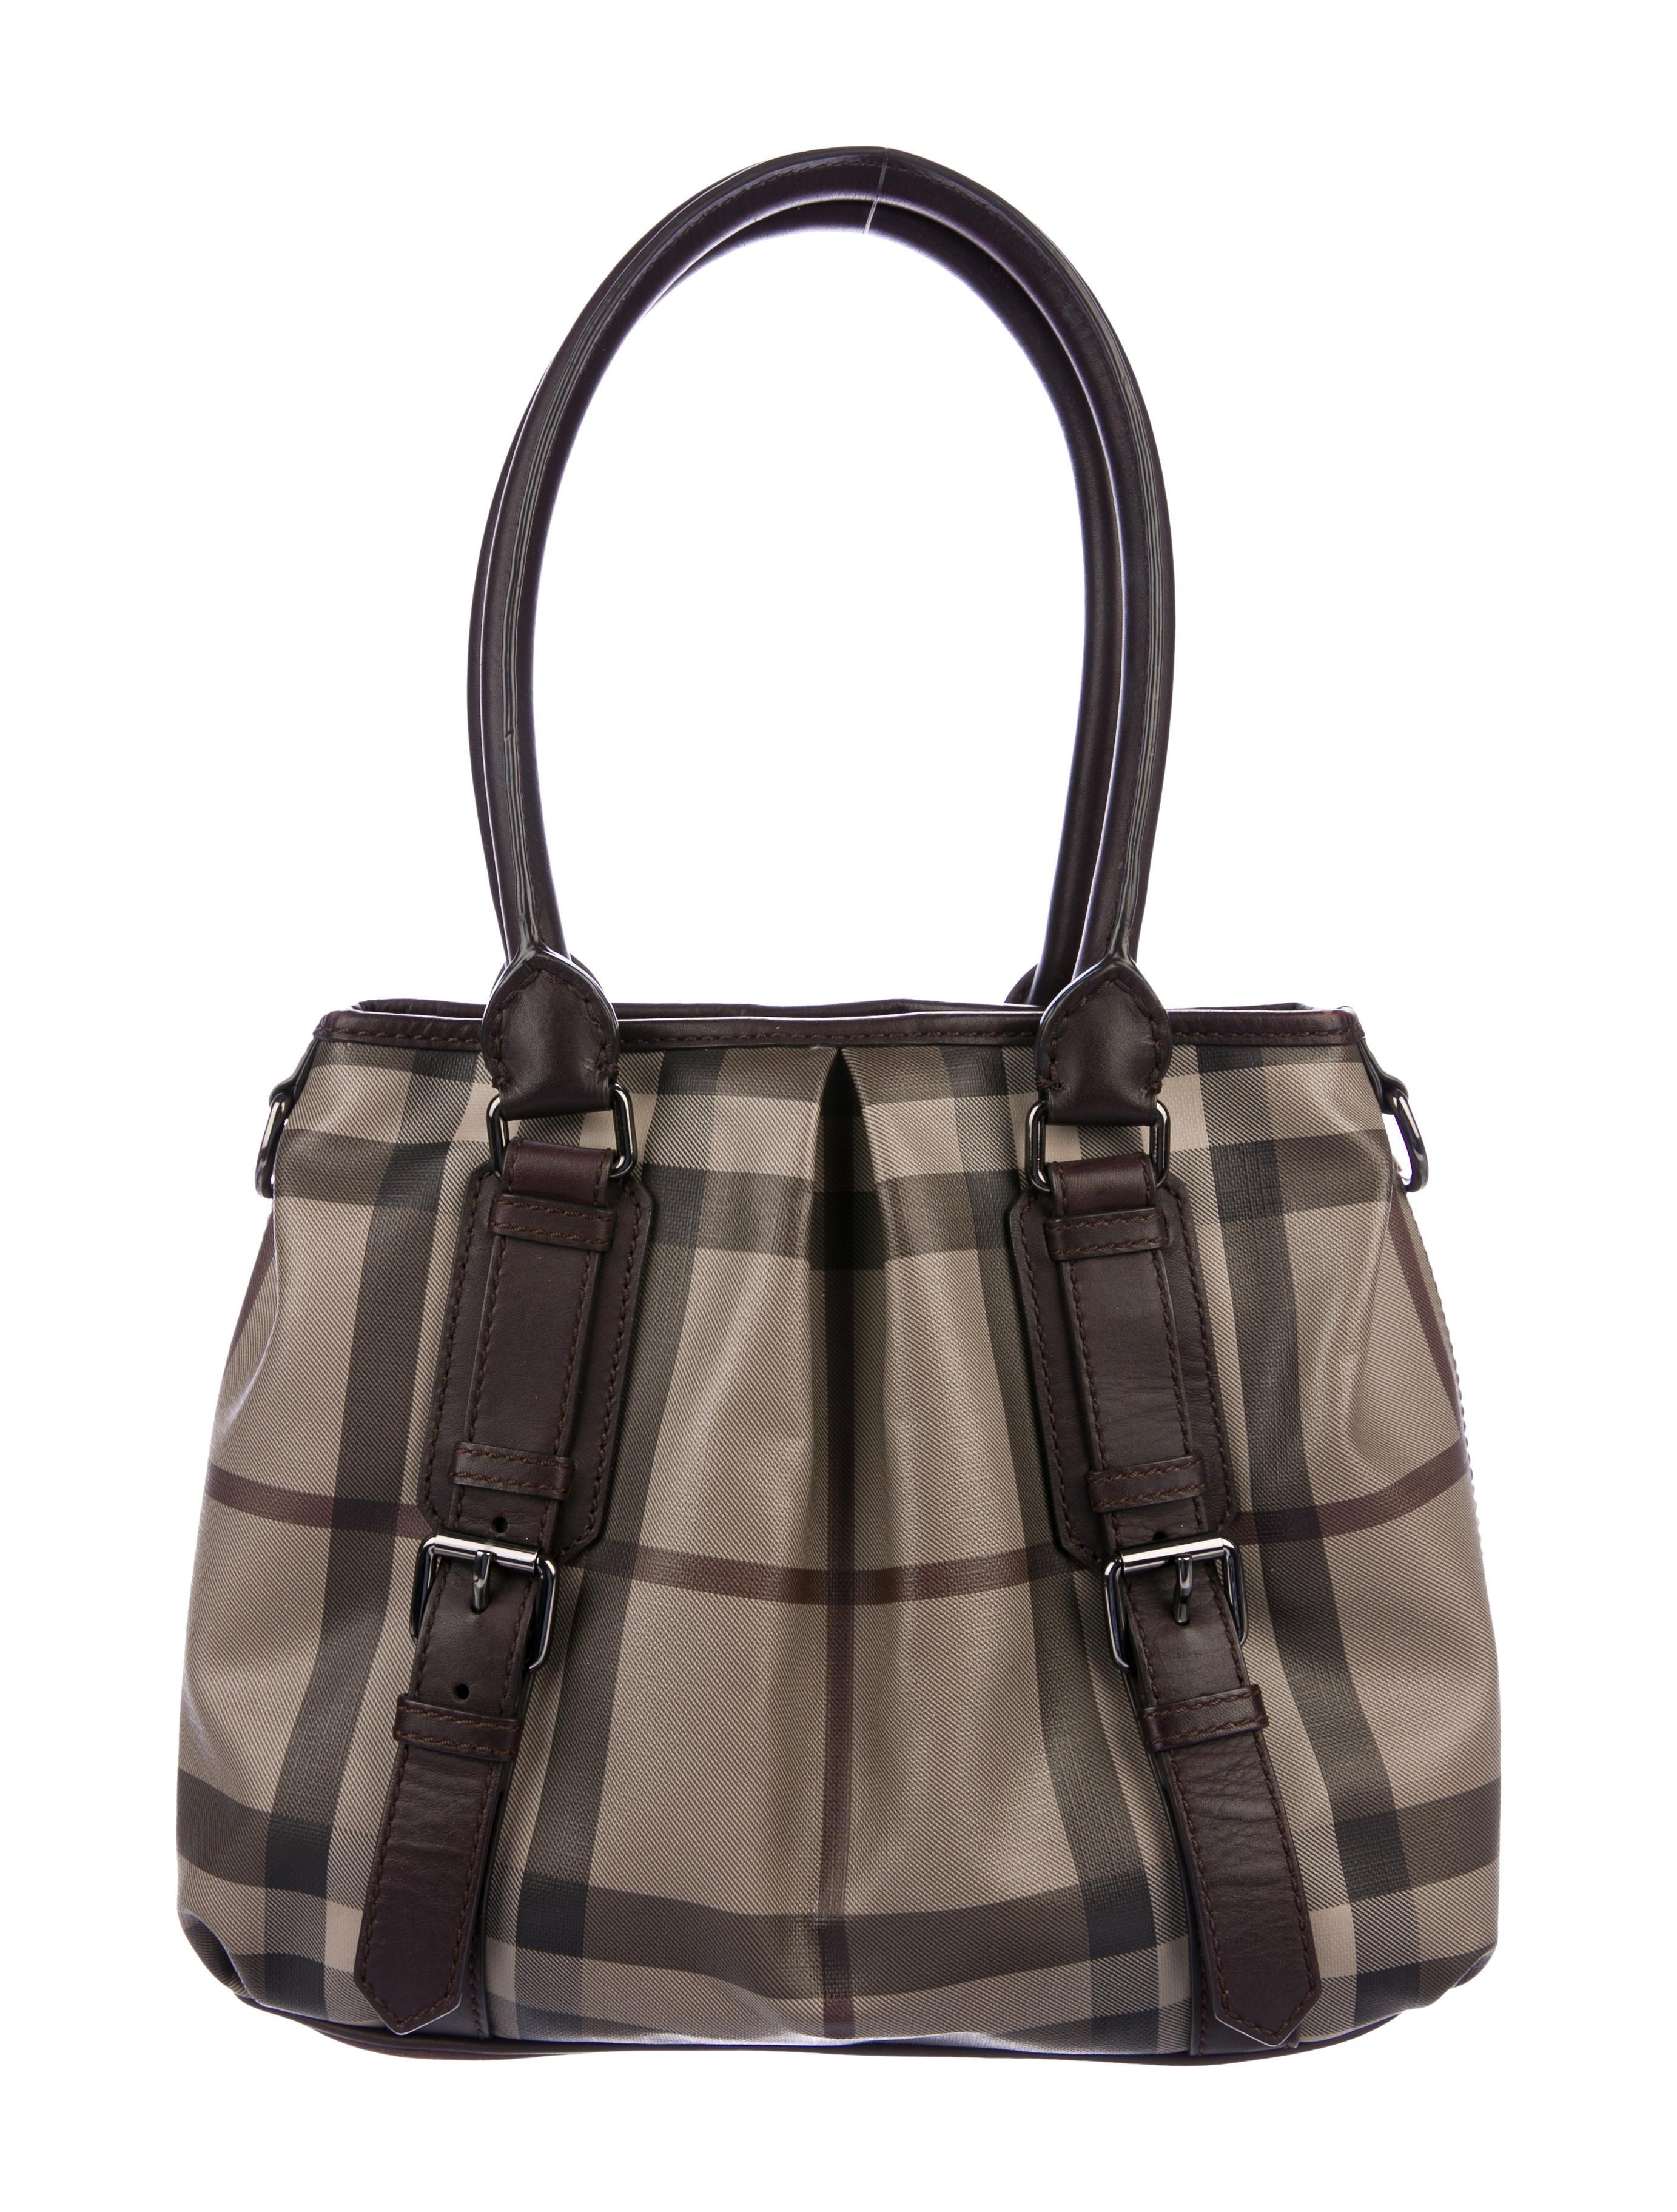 dc21961a717f Burberry Smoked Check Northfield Tote - Handbags - BUR95878